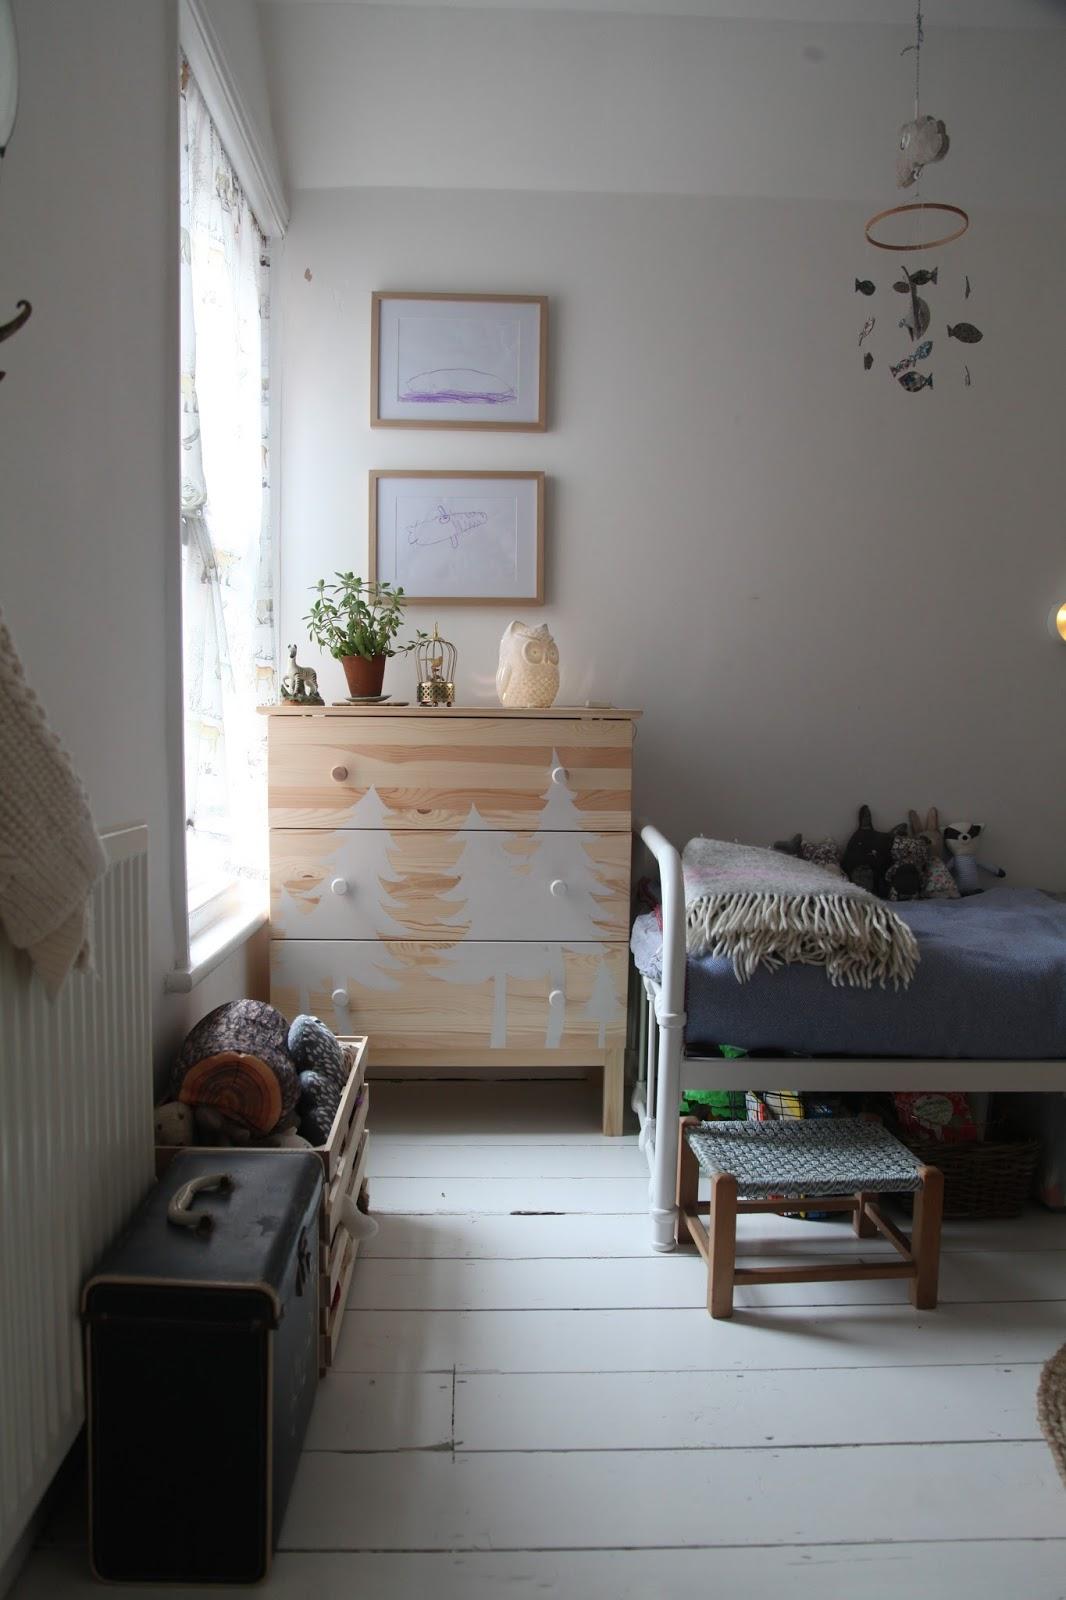 Little big room artemis russell for Artemis kitchen designs